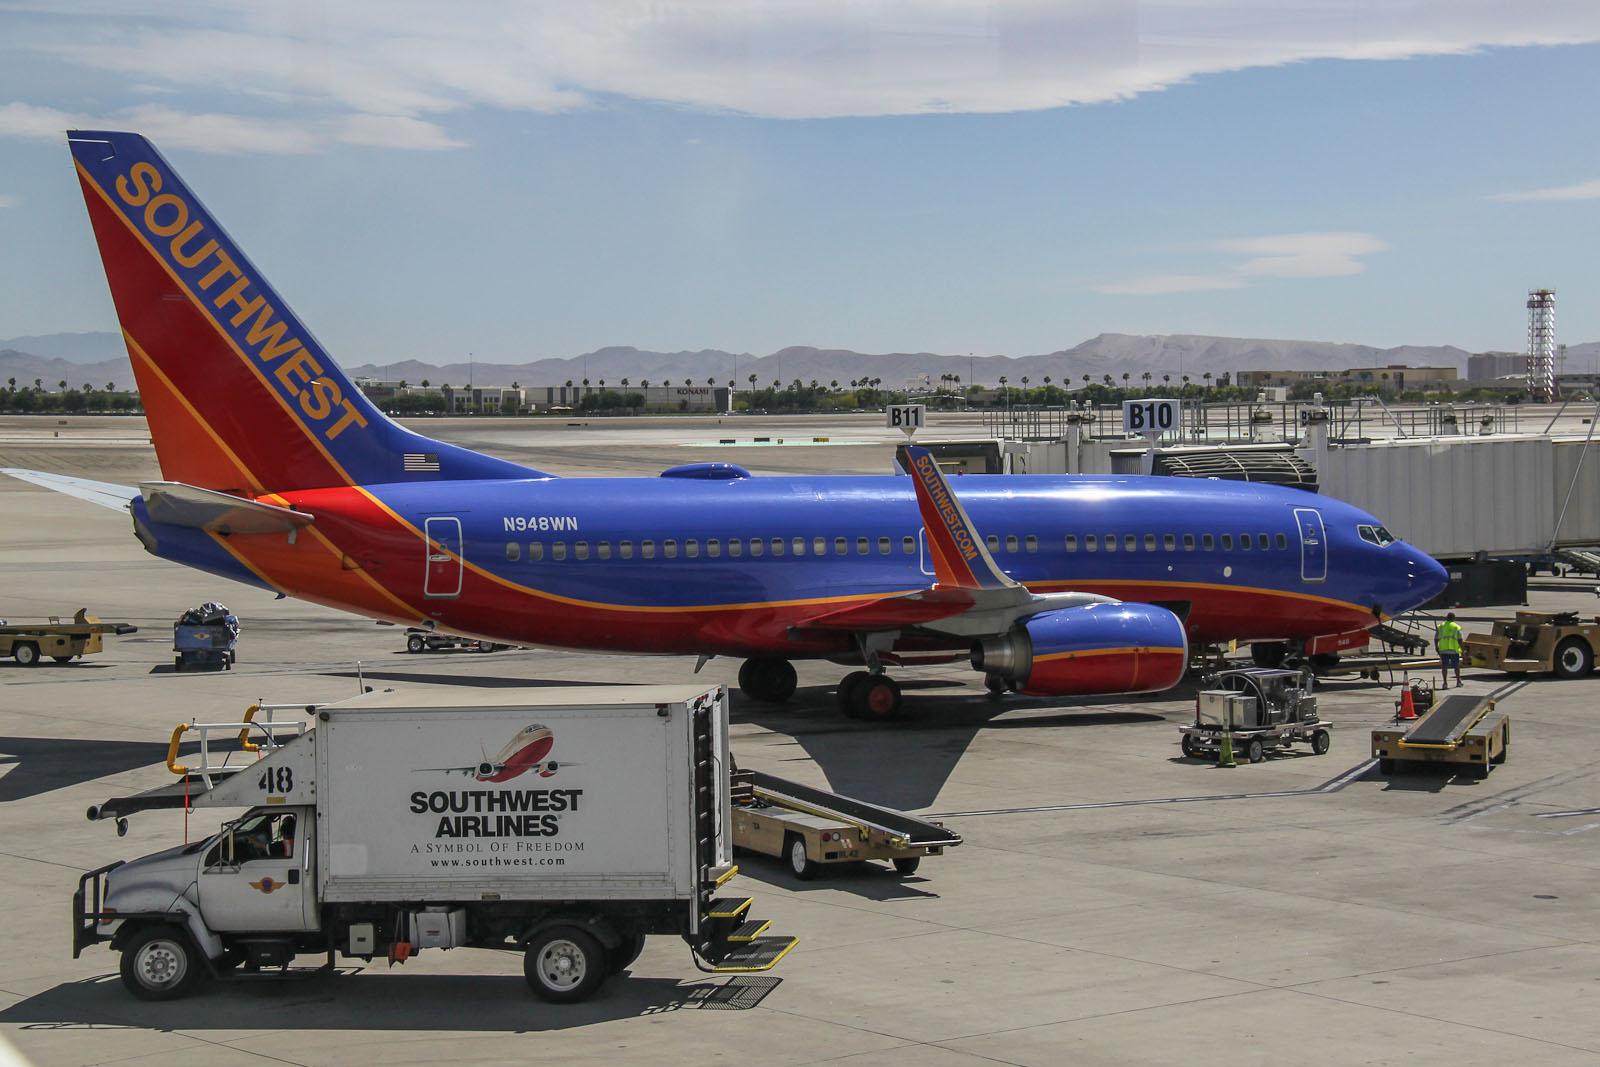 Boeing 737-700 N948WN авиакомпании Southwest в аэропорту Лас-Вегаса